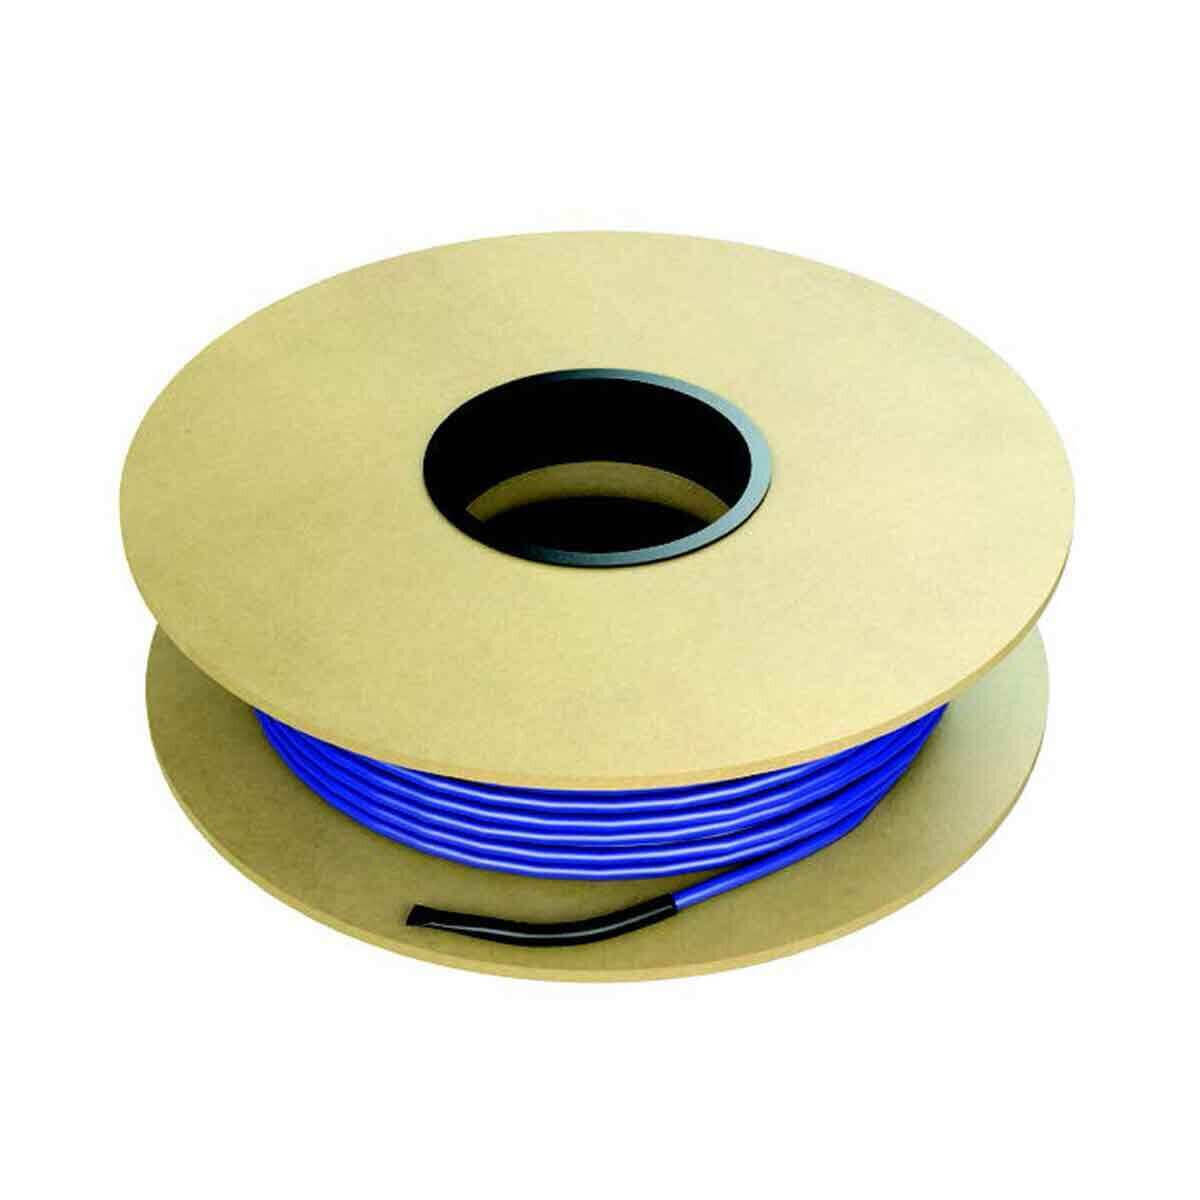 Laticrete Radiant Floor Heat Cable